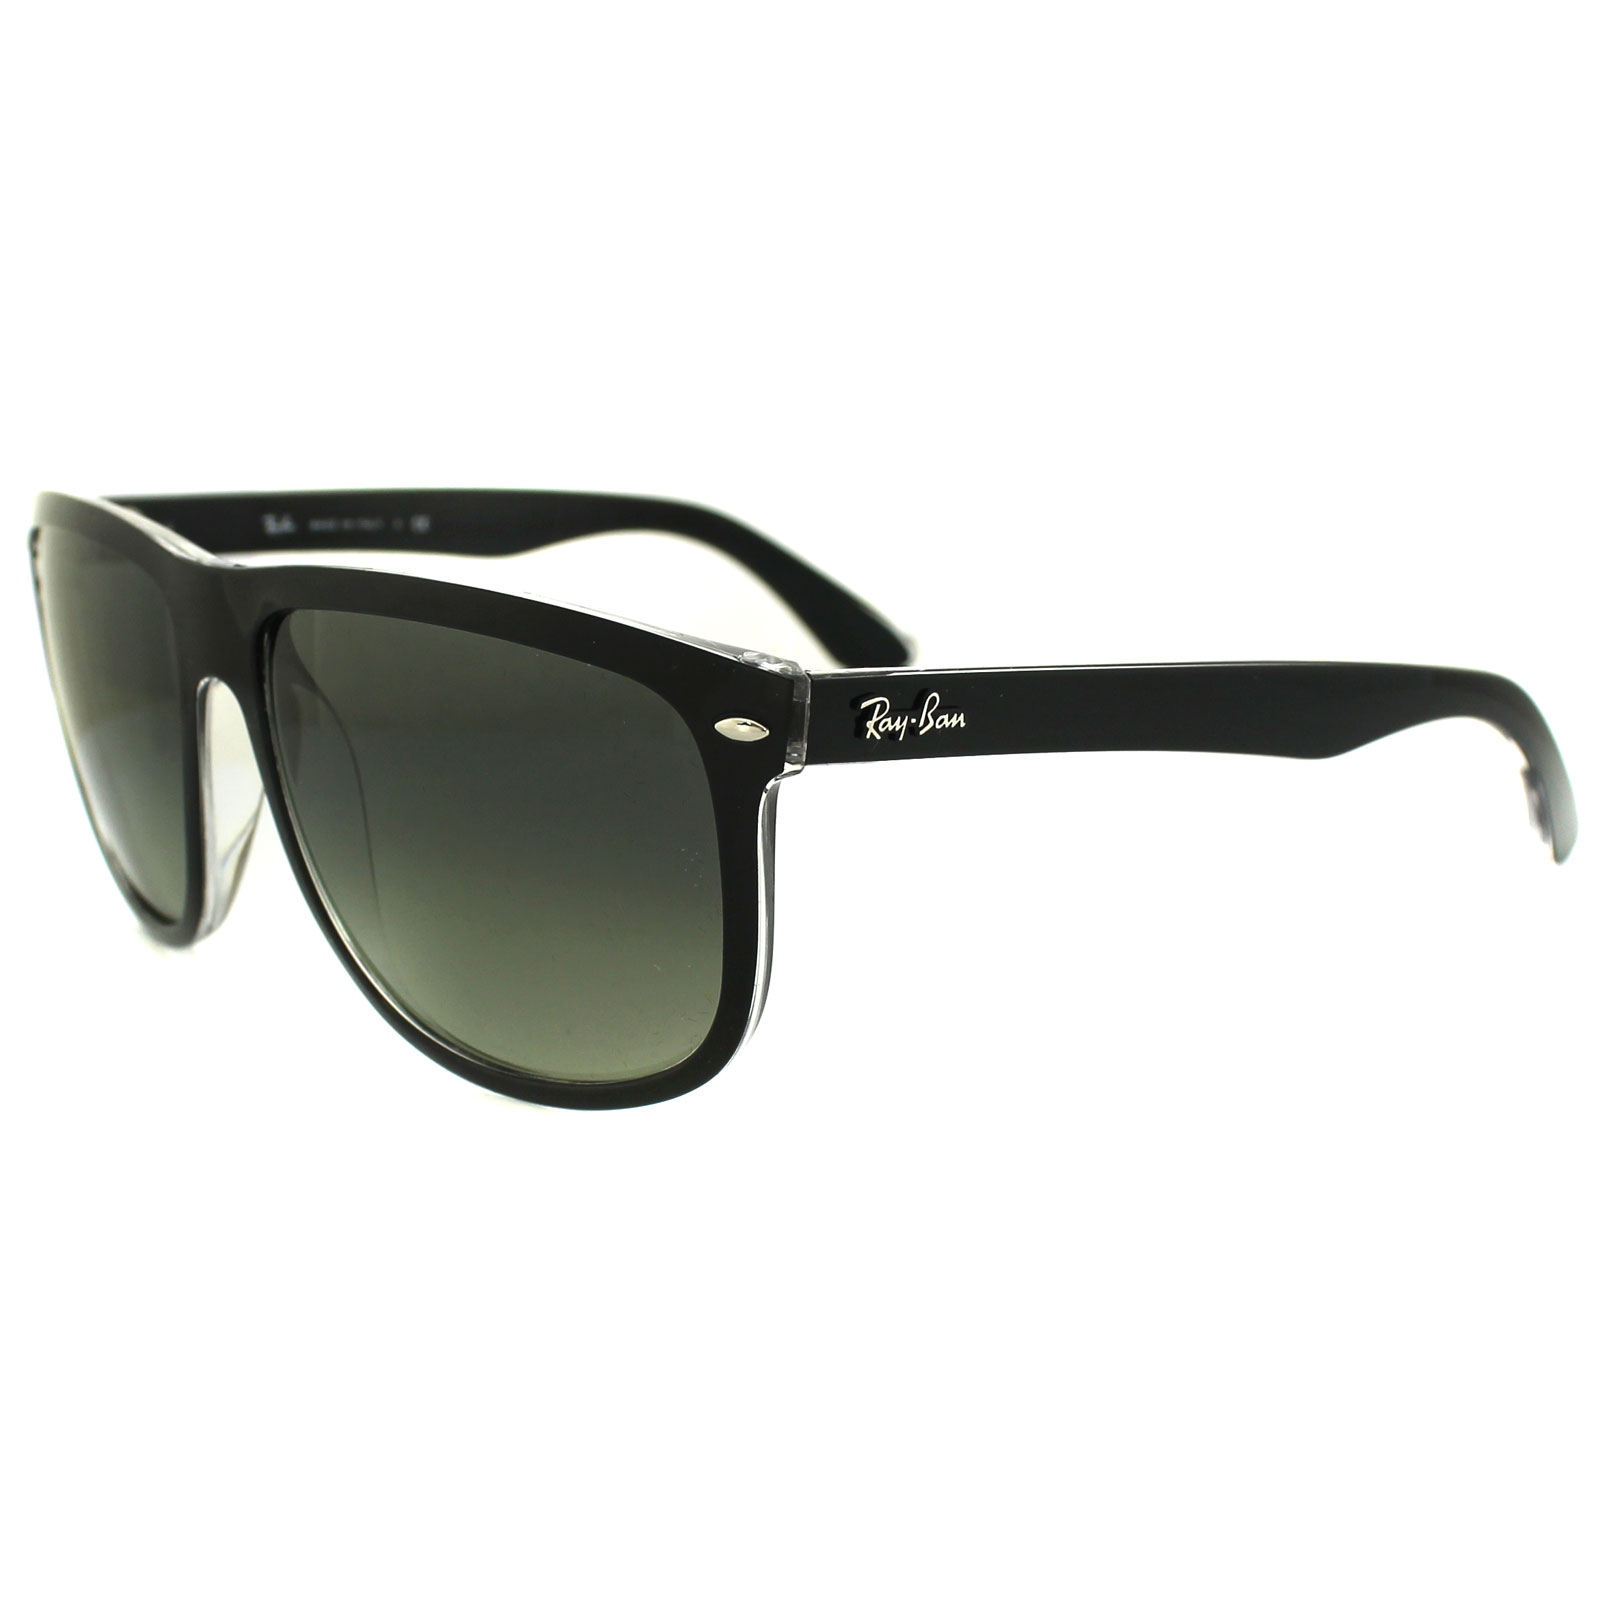 17a8c169f42 Ray Ban Sunglasses Australia Ebay « Heritage Malta